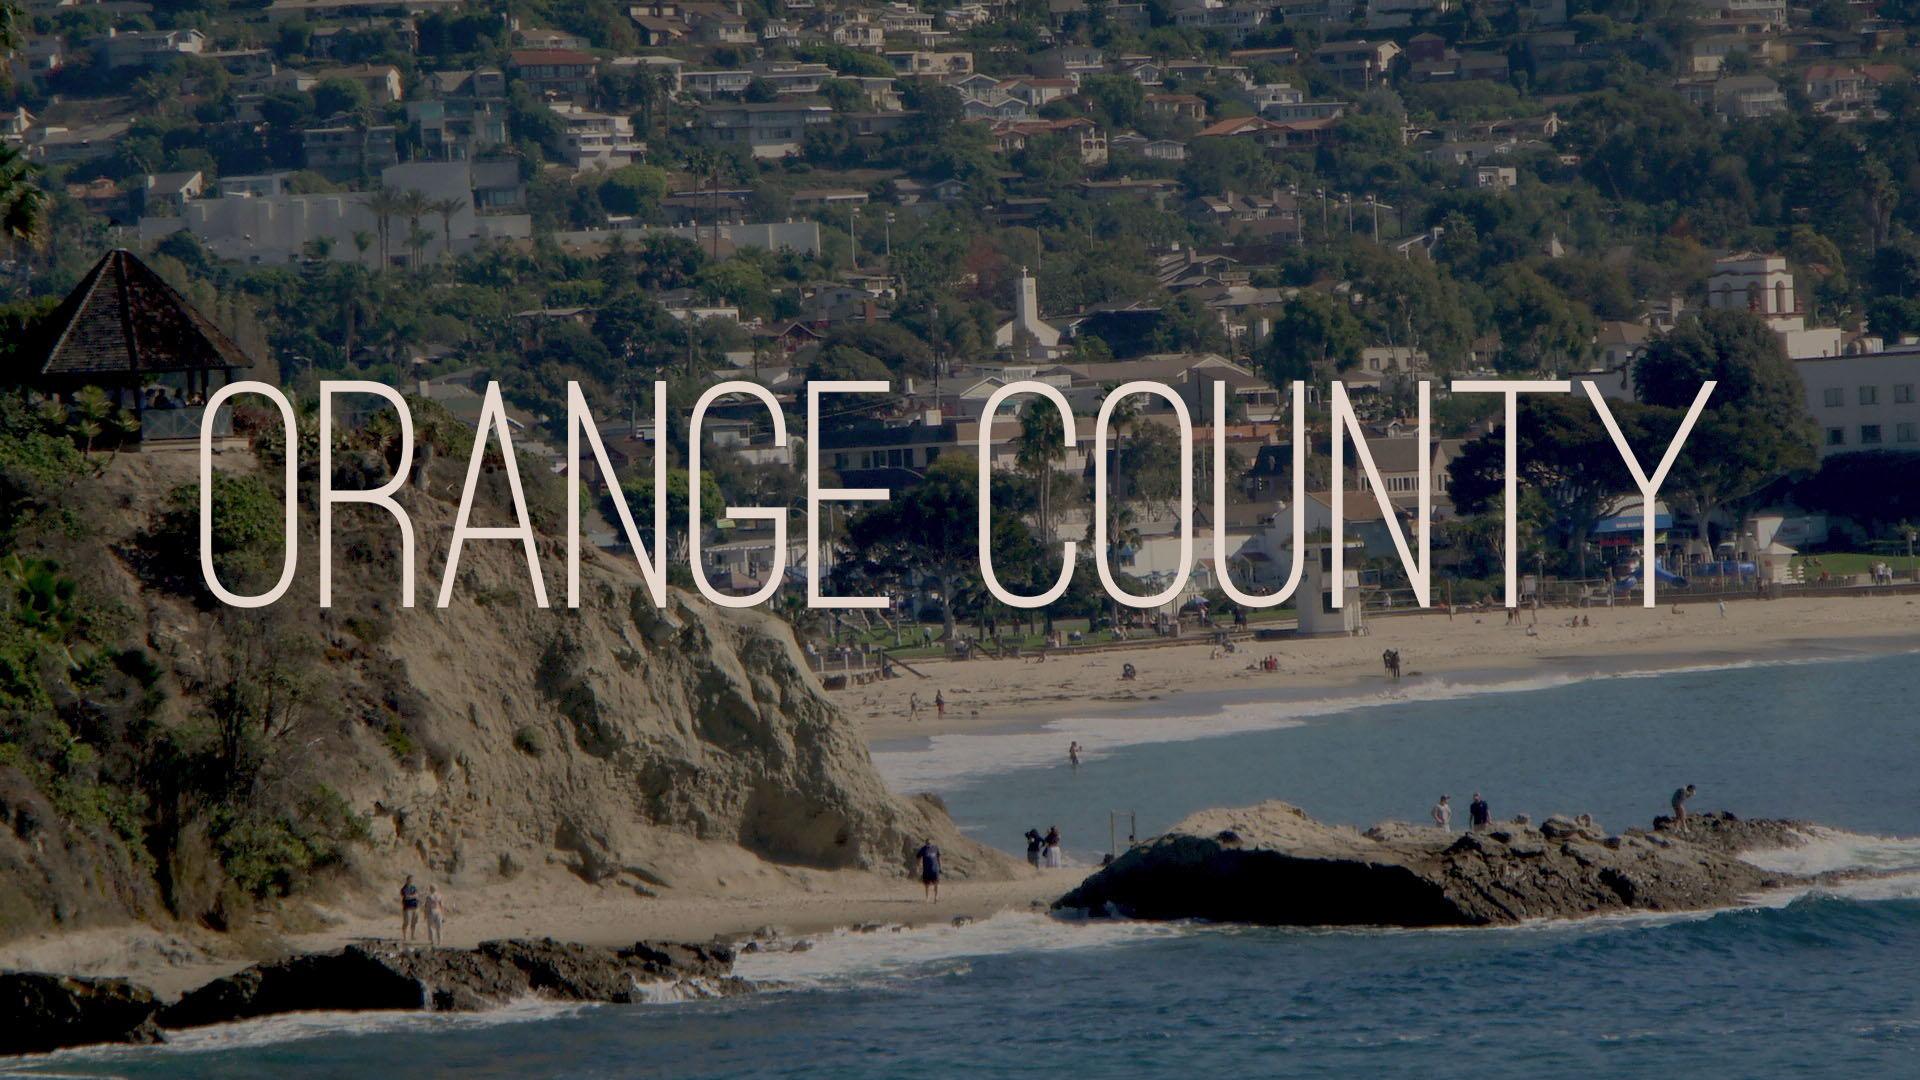 OrangeCounty.jpg